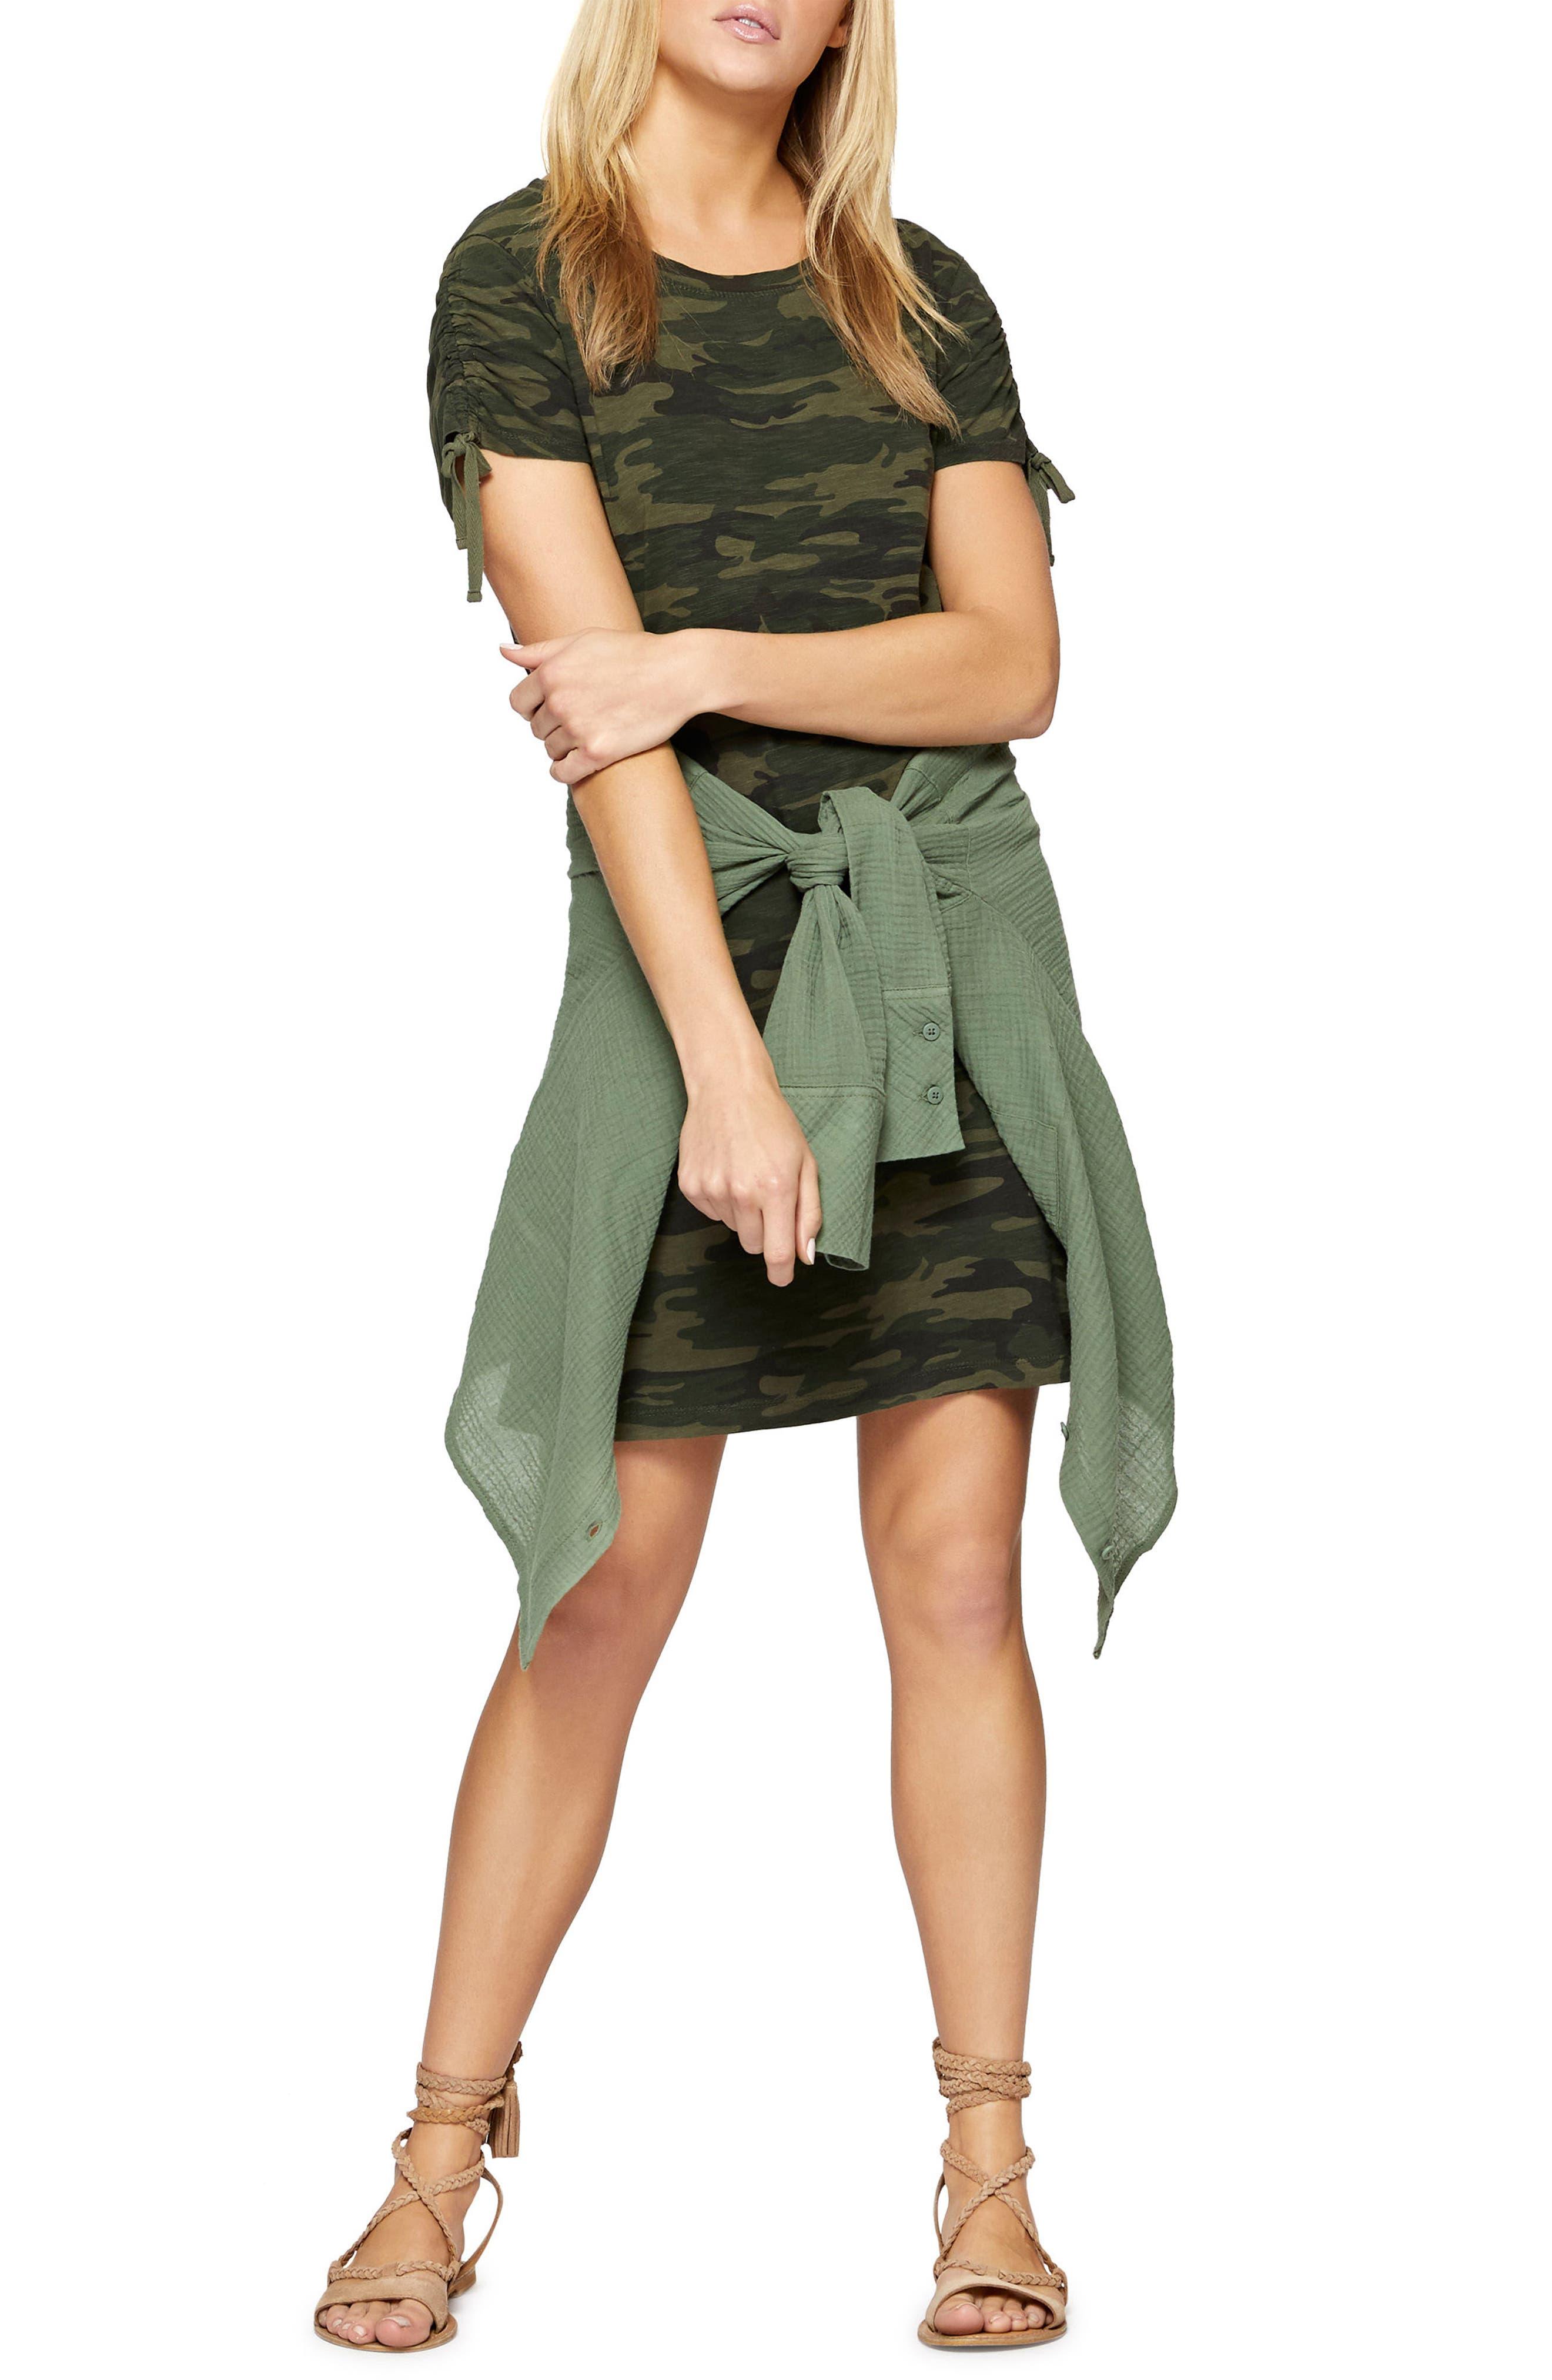 Ojai T-Shirt Dress,                             Alternate thumbnail 3, color,                             MOTHER NATURE CAMO